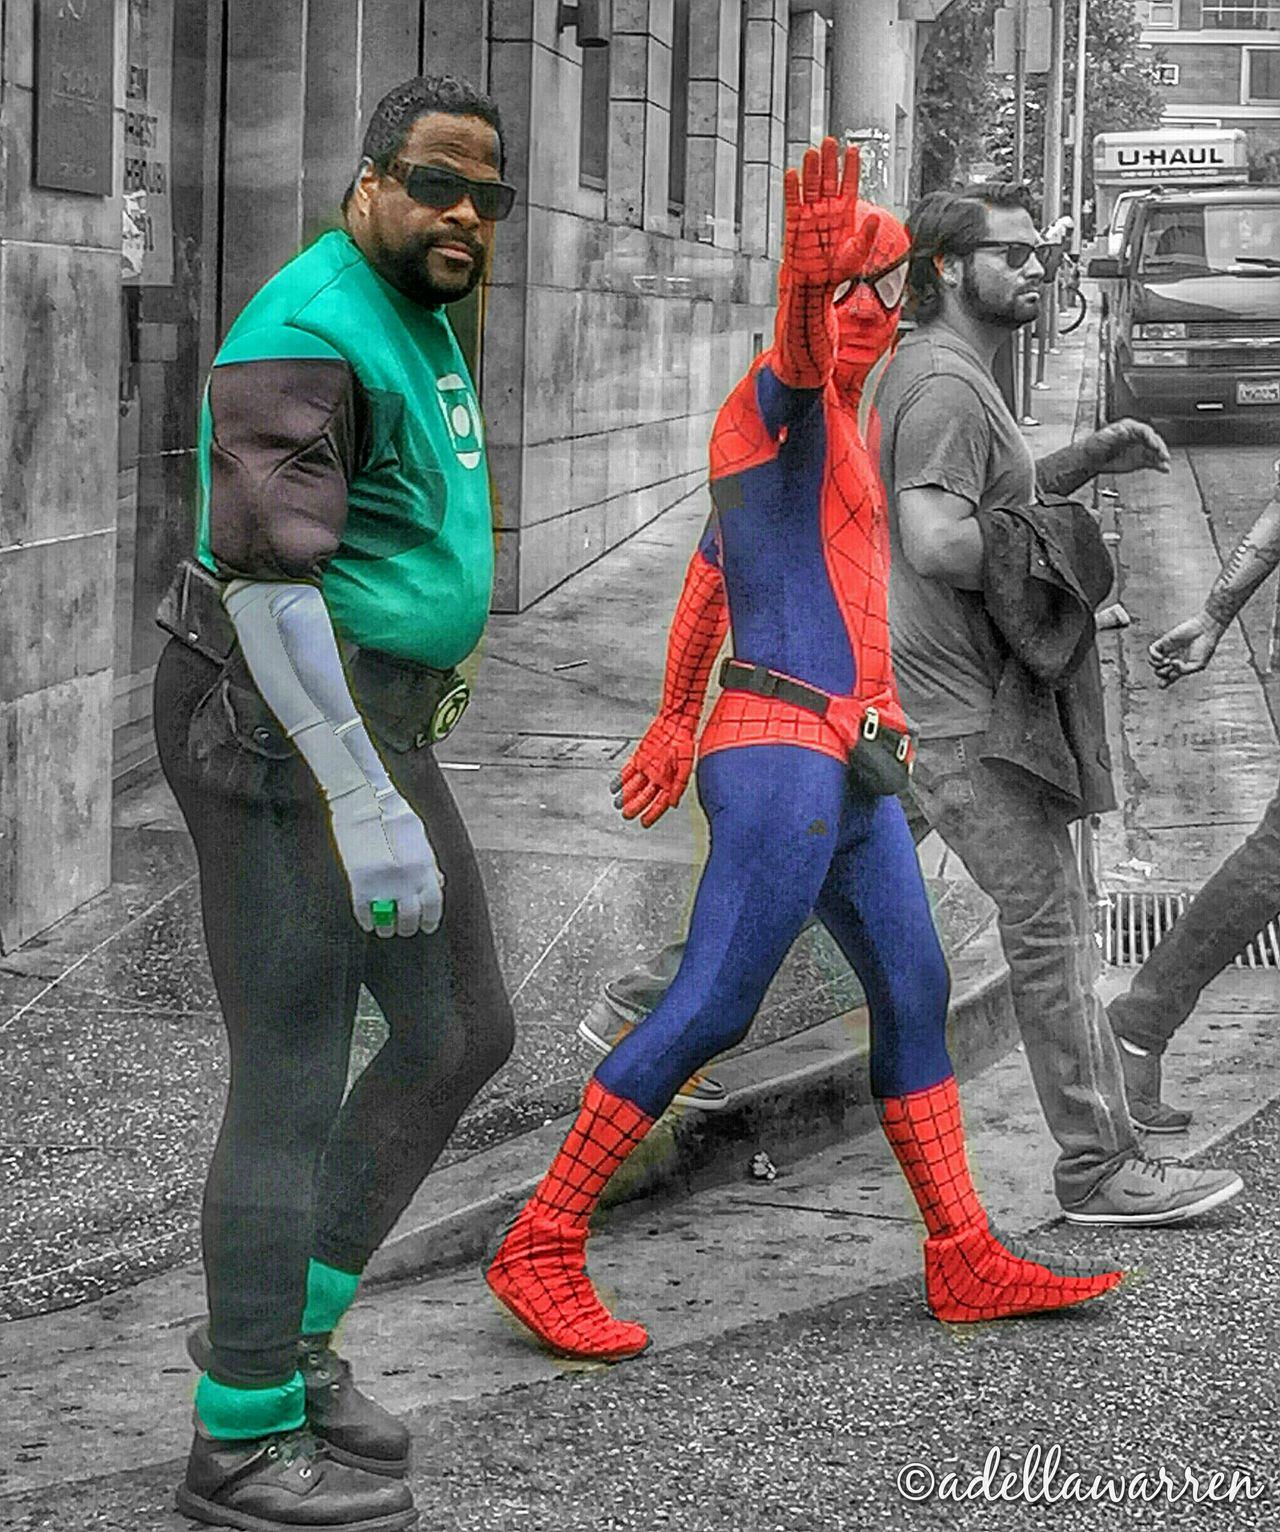 Hollywood Walk Of Fame Spiderman Spider-man Green Lantern  Superheroes California Hollywood Los Angeles, California